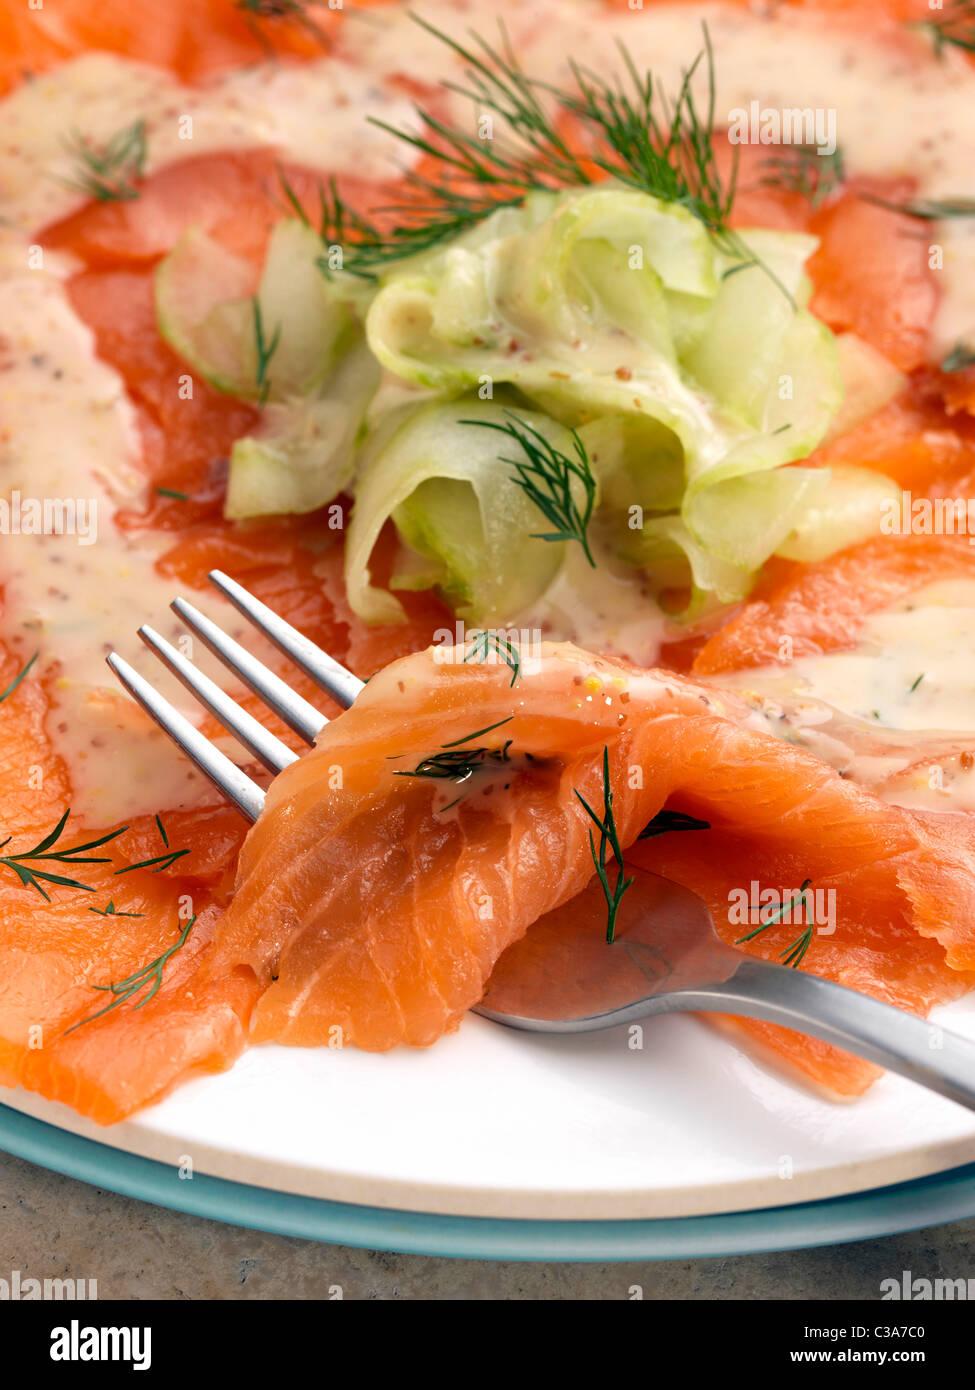 Smoked salmon gravadlax cucumber dill mustard dressing - Stock Image